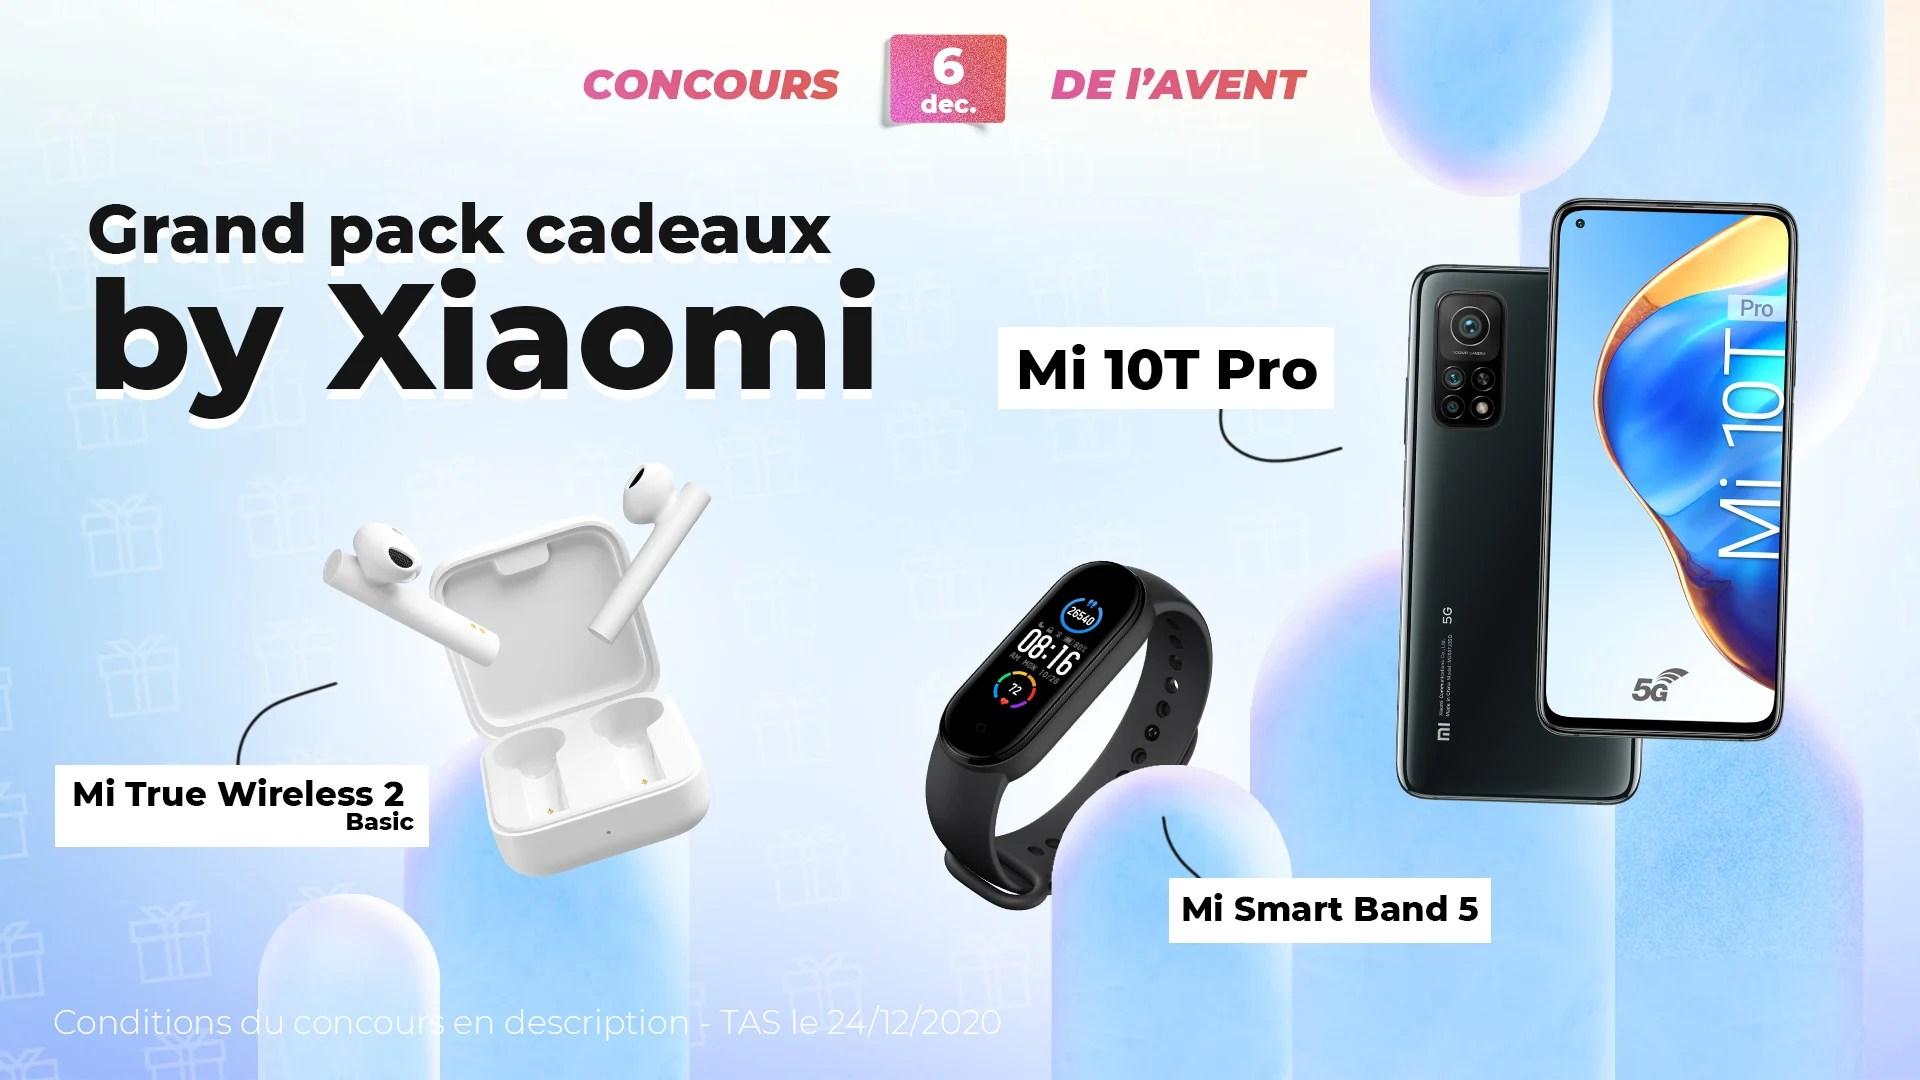 #FrandroidOffreMoi un gros lot Xiaomi (Mi 10T Pro, Mi Smart Band 5 et Mi True Wireless 2 Basic)